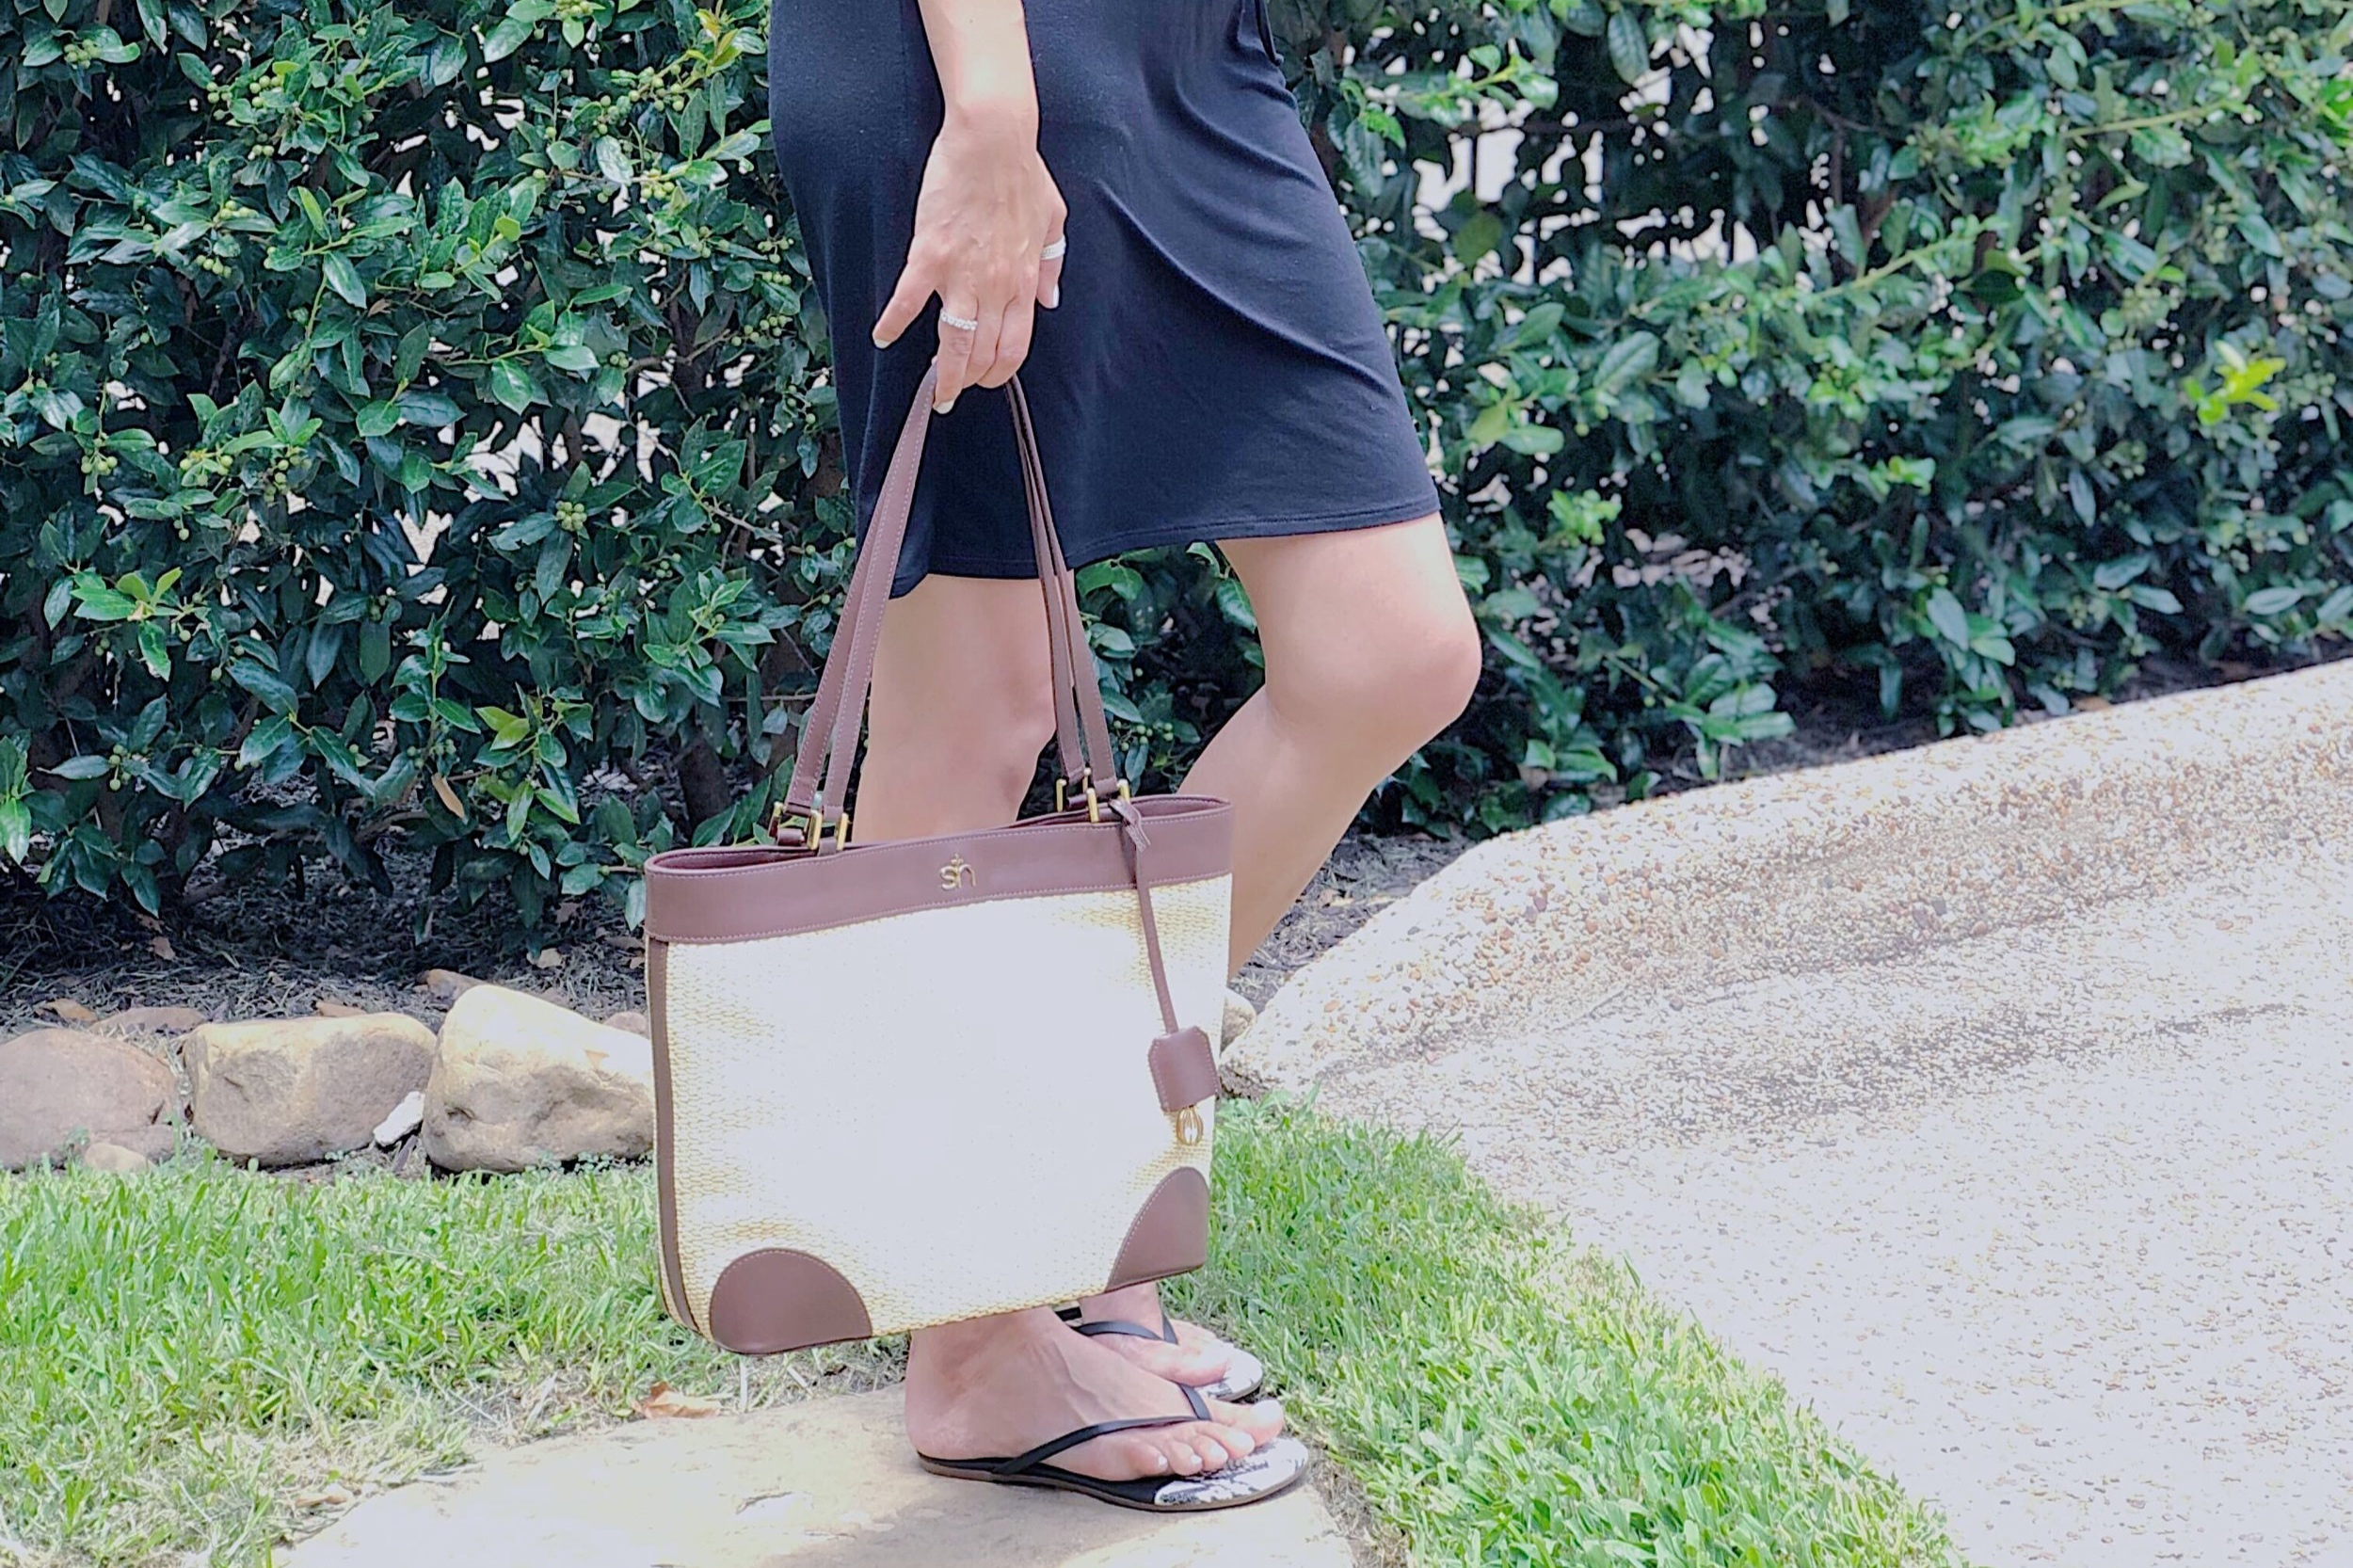 The  Swatzell + Heilig  handbag is one of my favorite handbags.